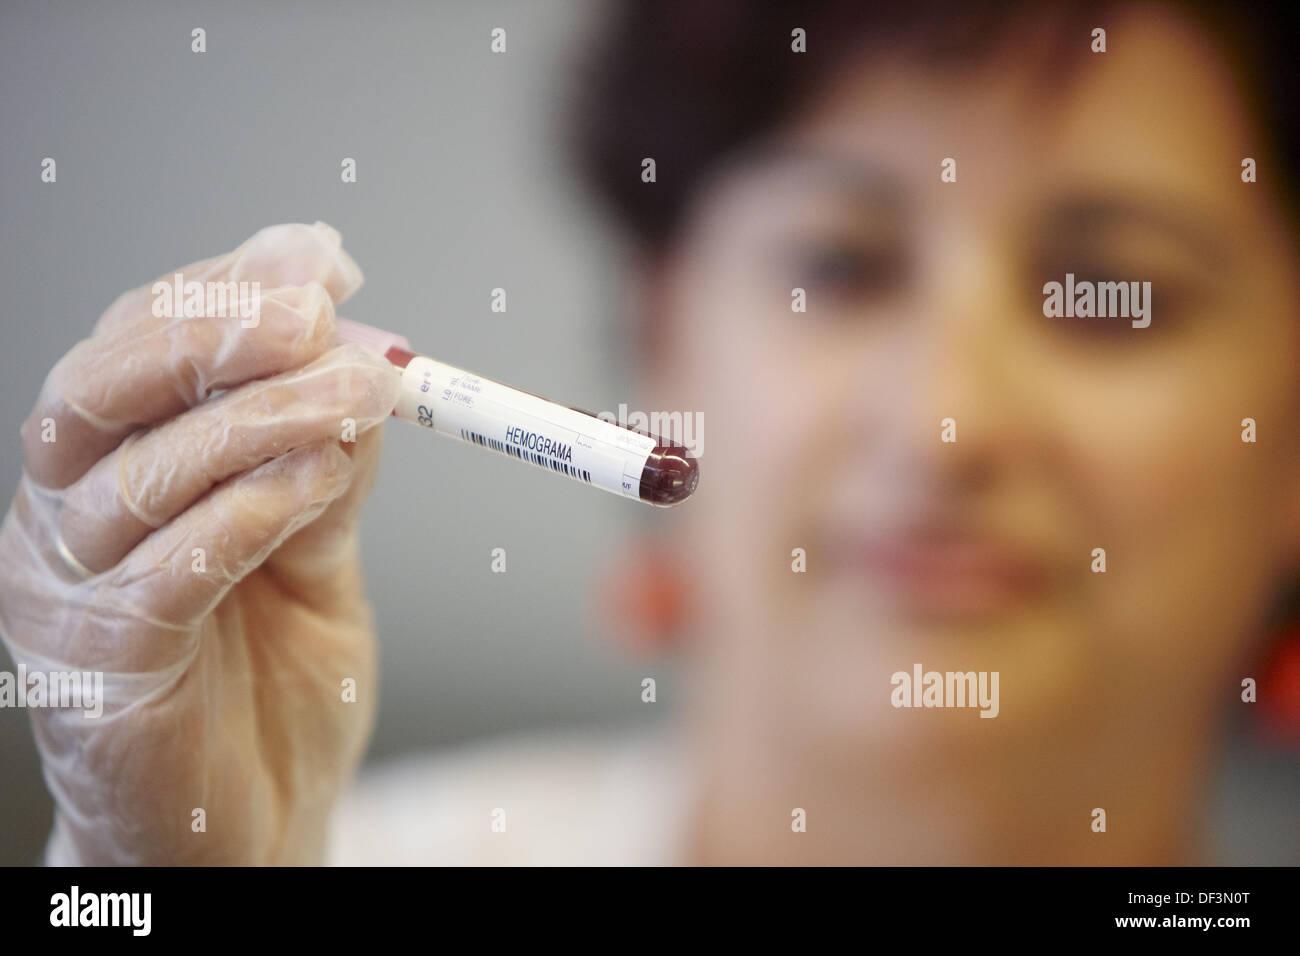 Blood sample, haematology. Hospital Universitario de Gran Canaria Doctor Negrin, Las Palmas de Gran Canaria. Canary Islands, - Stock Image